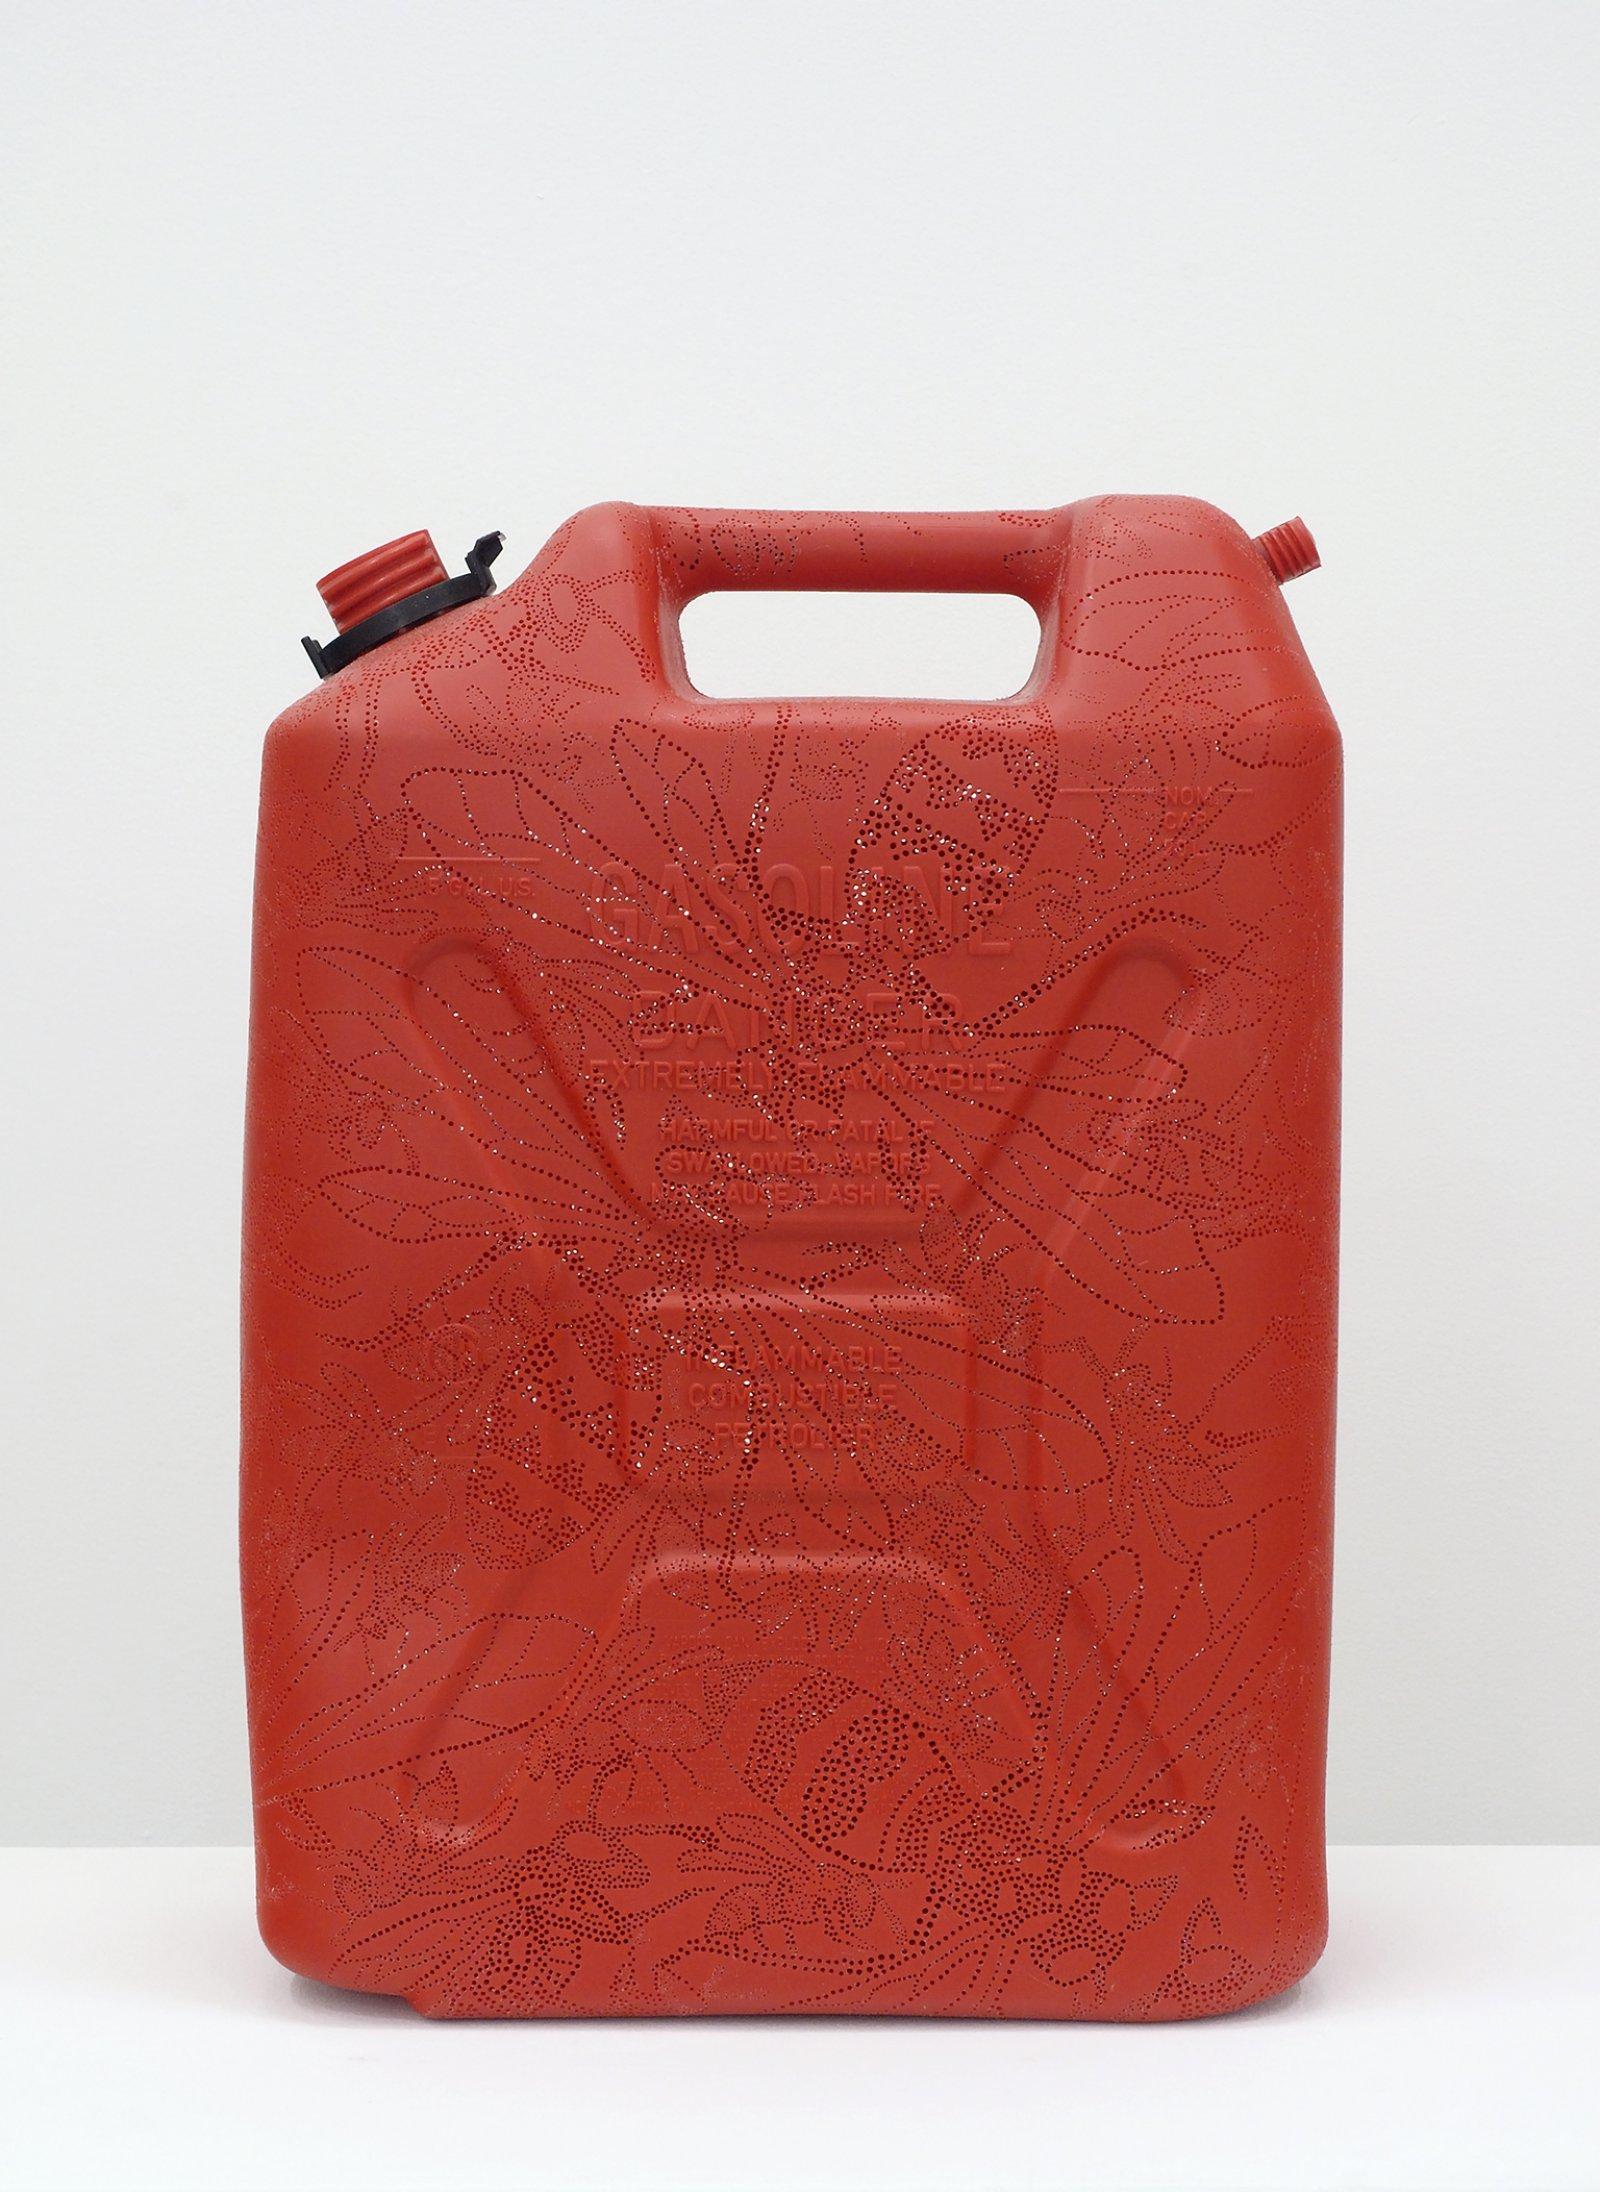 Brian Jungen,Wasp, 2008, carved gallon gasoline jug, 18 x 13 x 7 in. (46 x 33 x 18 cm)